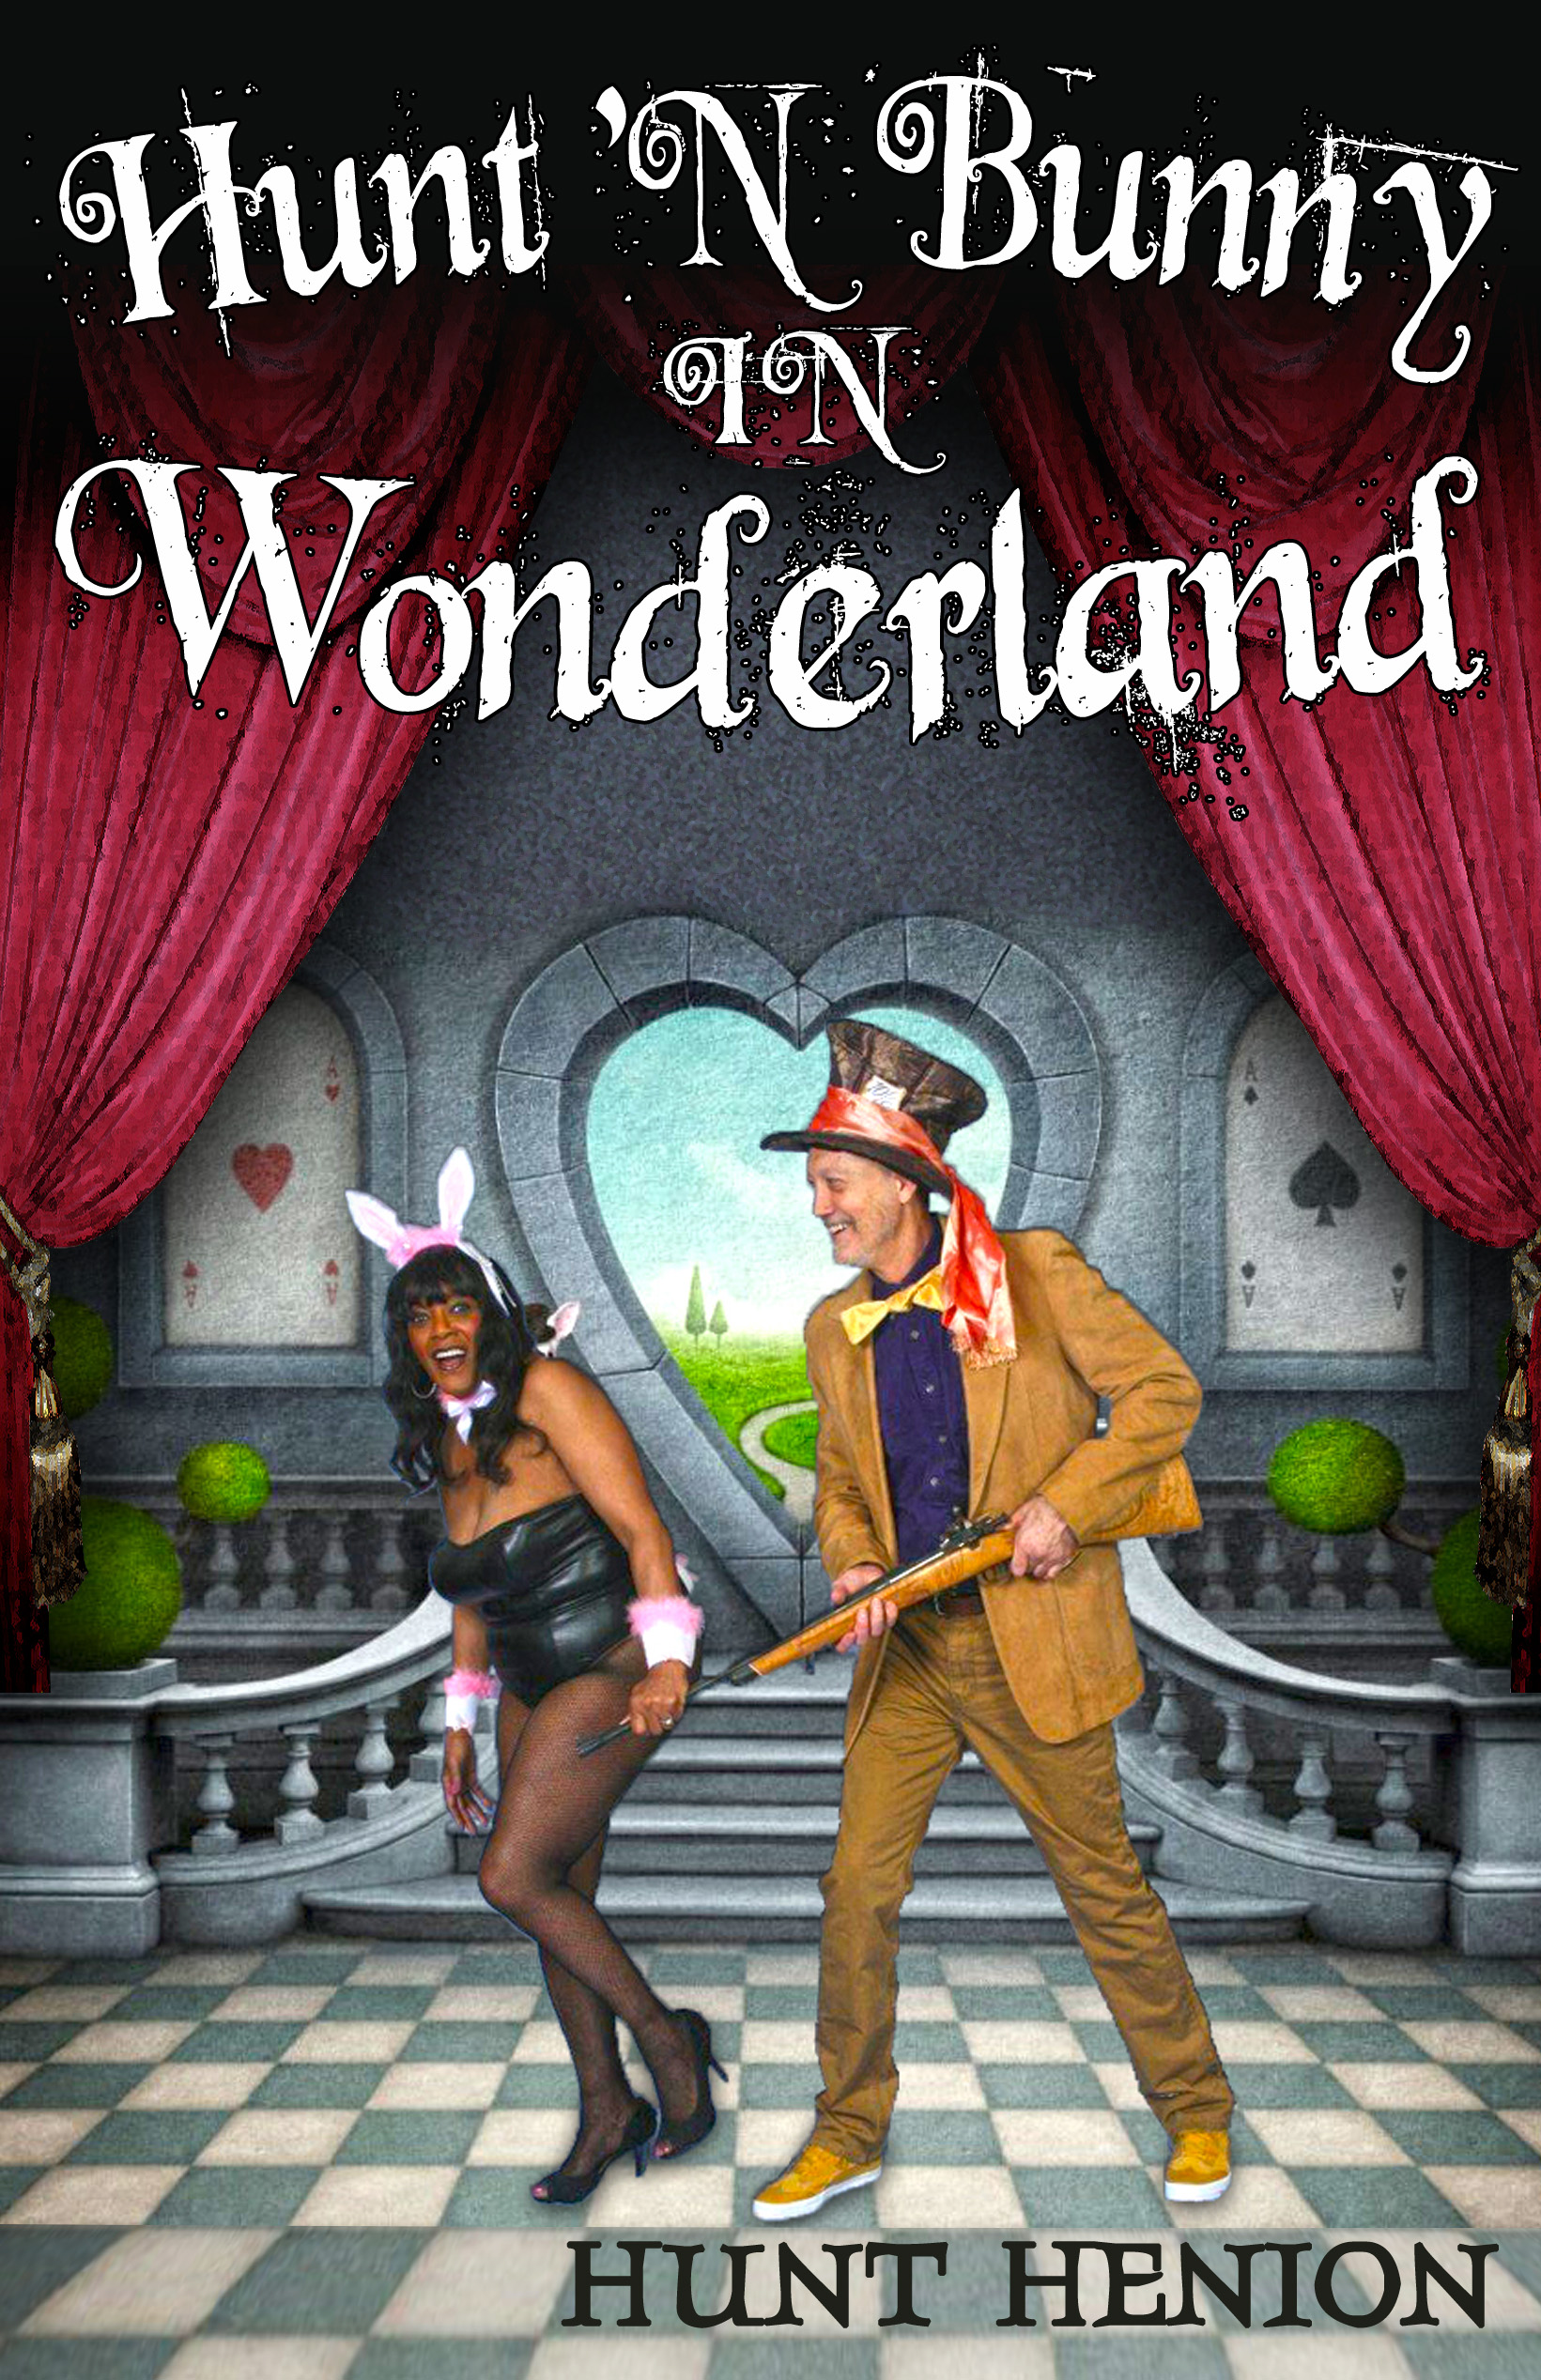 Relationship Revelations from Hunt & Bunny's Adventures in Wonderland